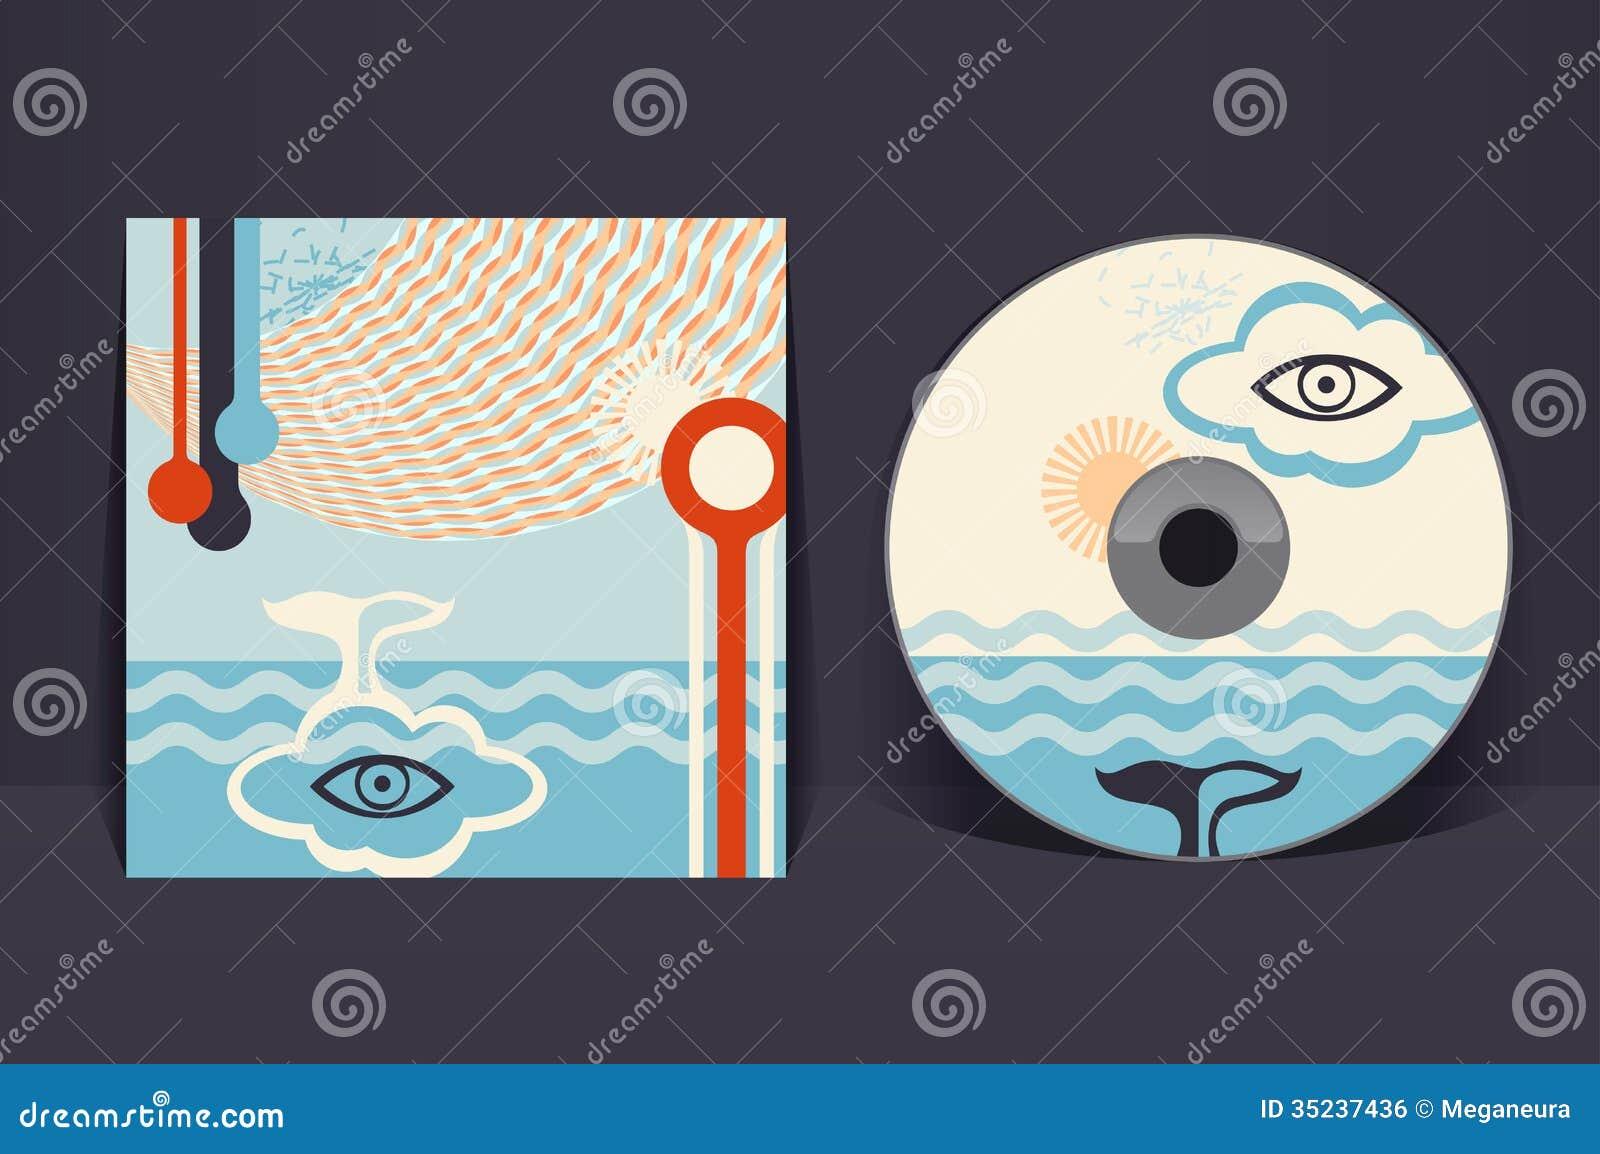 Cd Cover Design Template. CD Cover Design Template EPS 10 Vector ...